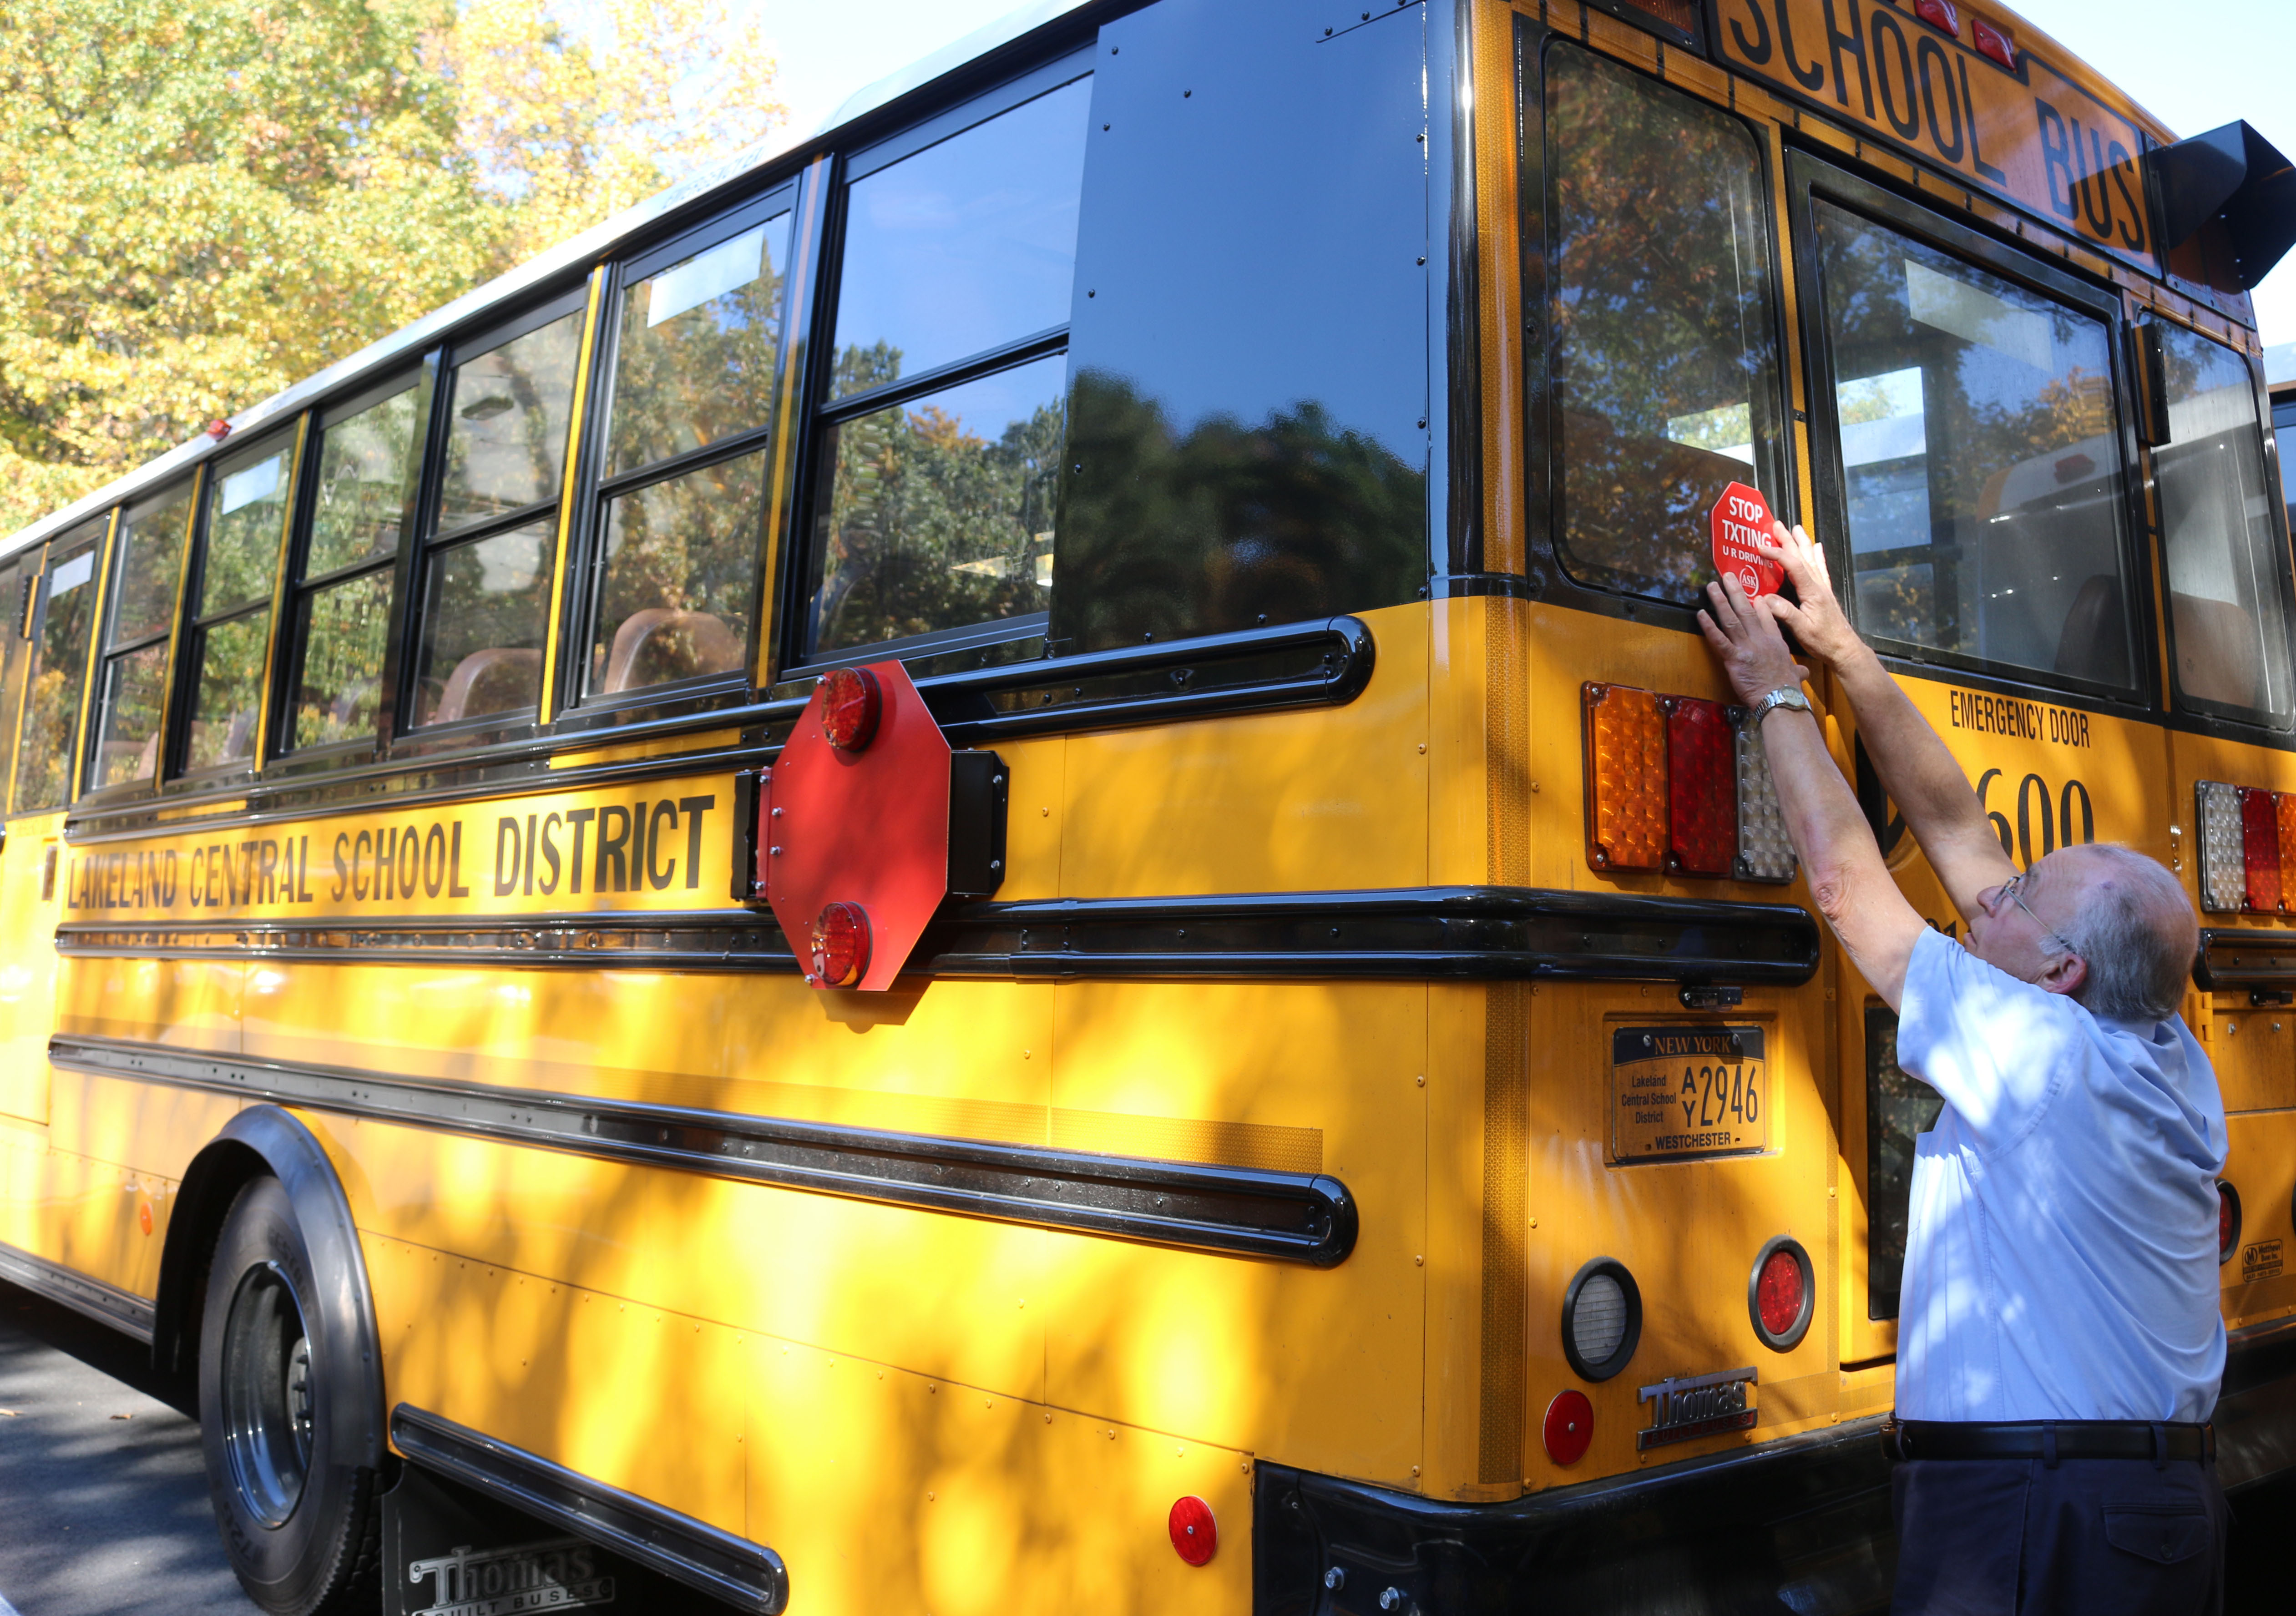 lcsd-transportation-assistant-supervisor-paul-cavaluzzi-placing-decal-on-bus